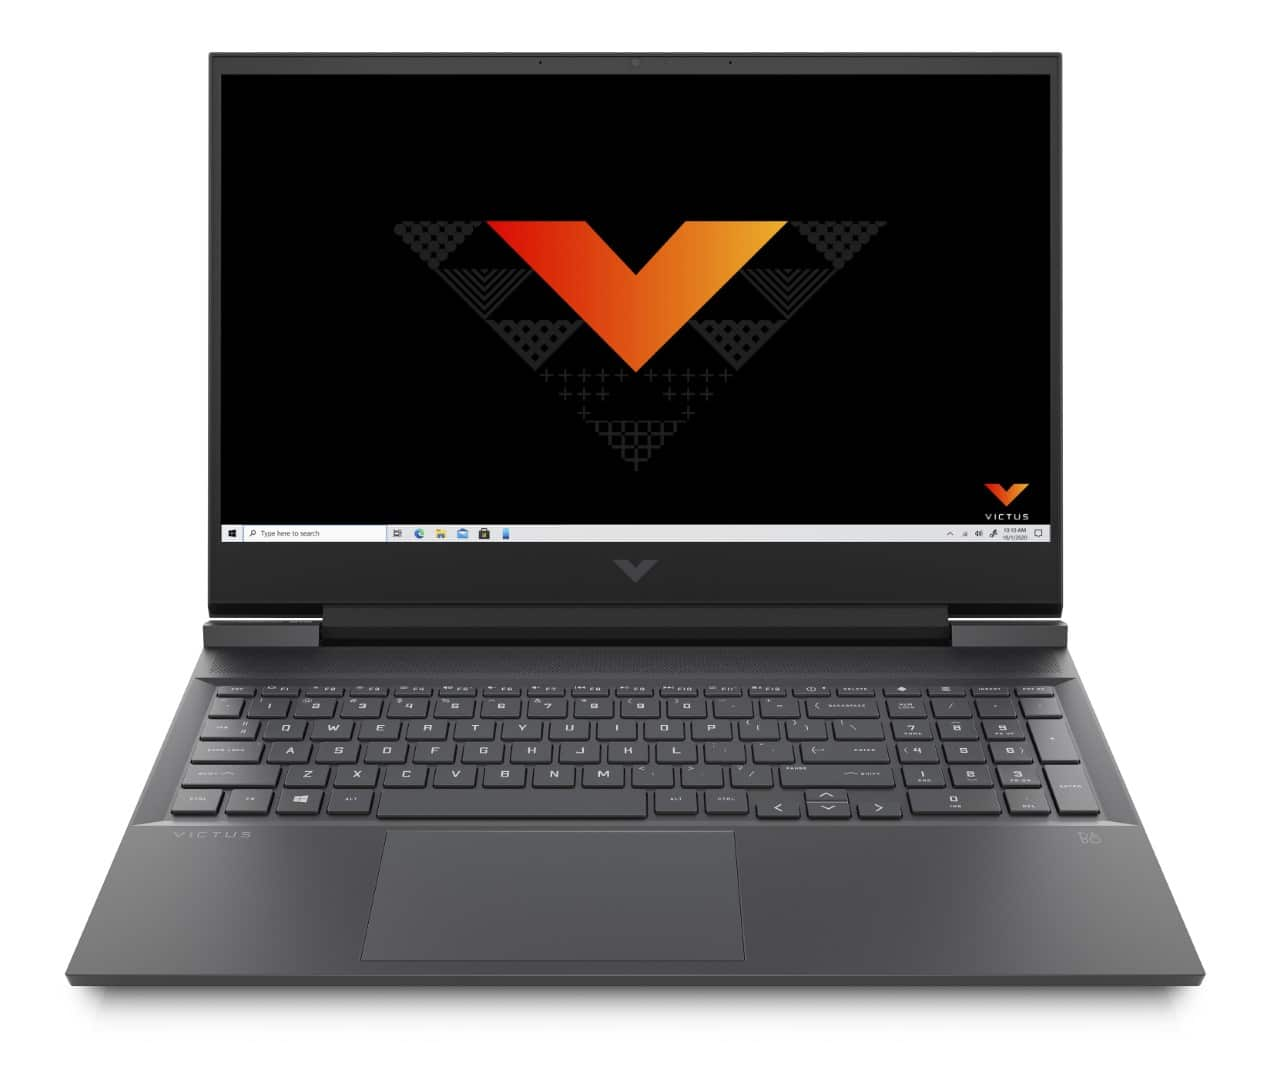 Victus 16L Laptop - Mica Silver - 1 (Large)